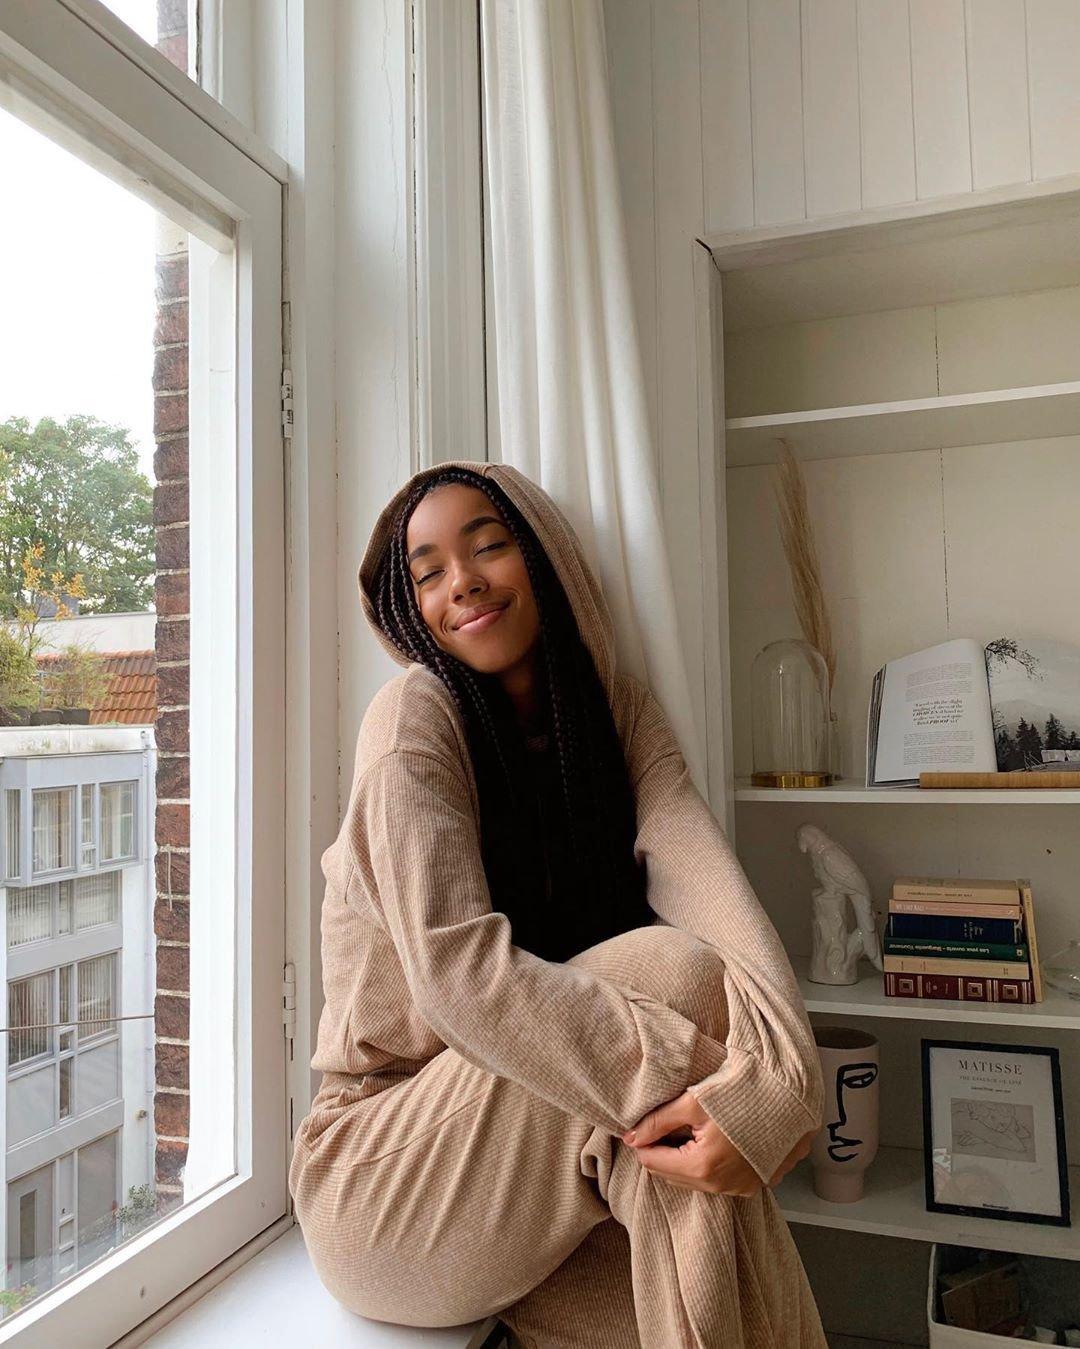 Amaka Hamelijnck - Pijamas estilosos - pijamas - inverno  - em casa  - https://stealthelook.com.br